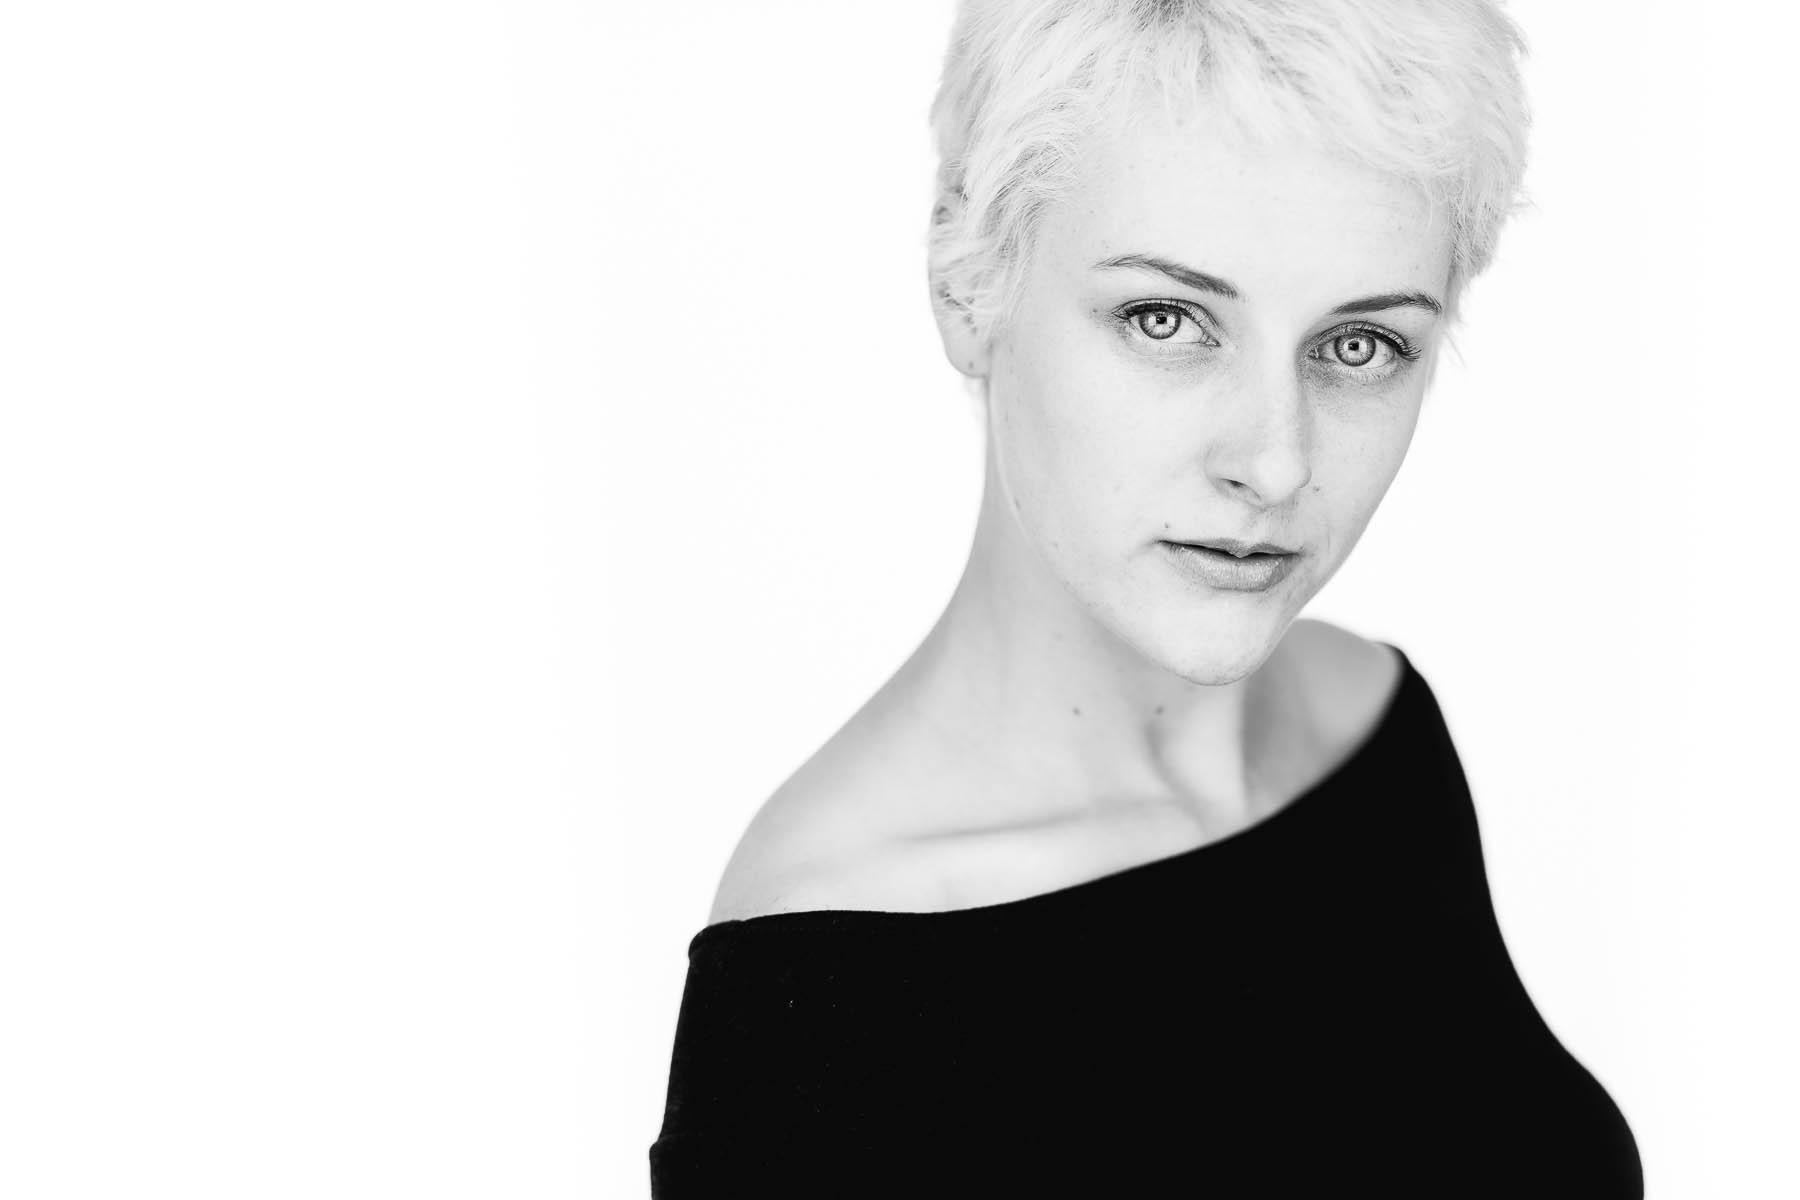 sarah-actor-professional-headshot-session-22.jpg